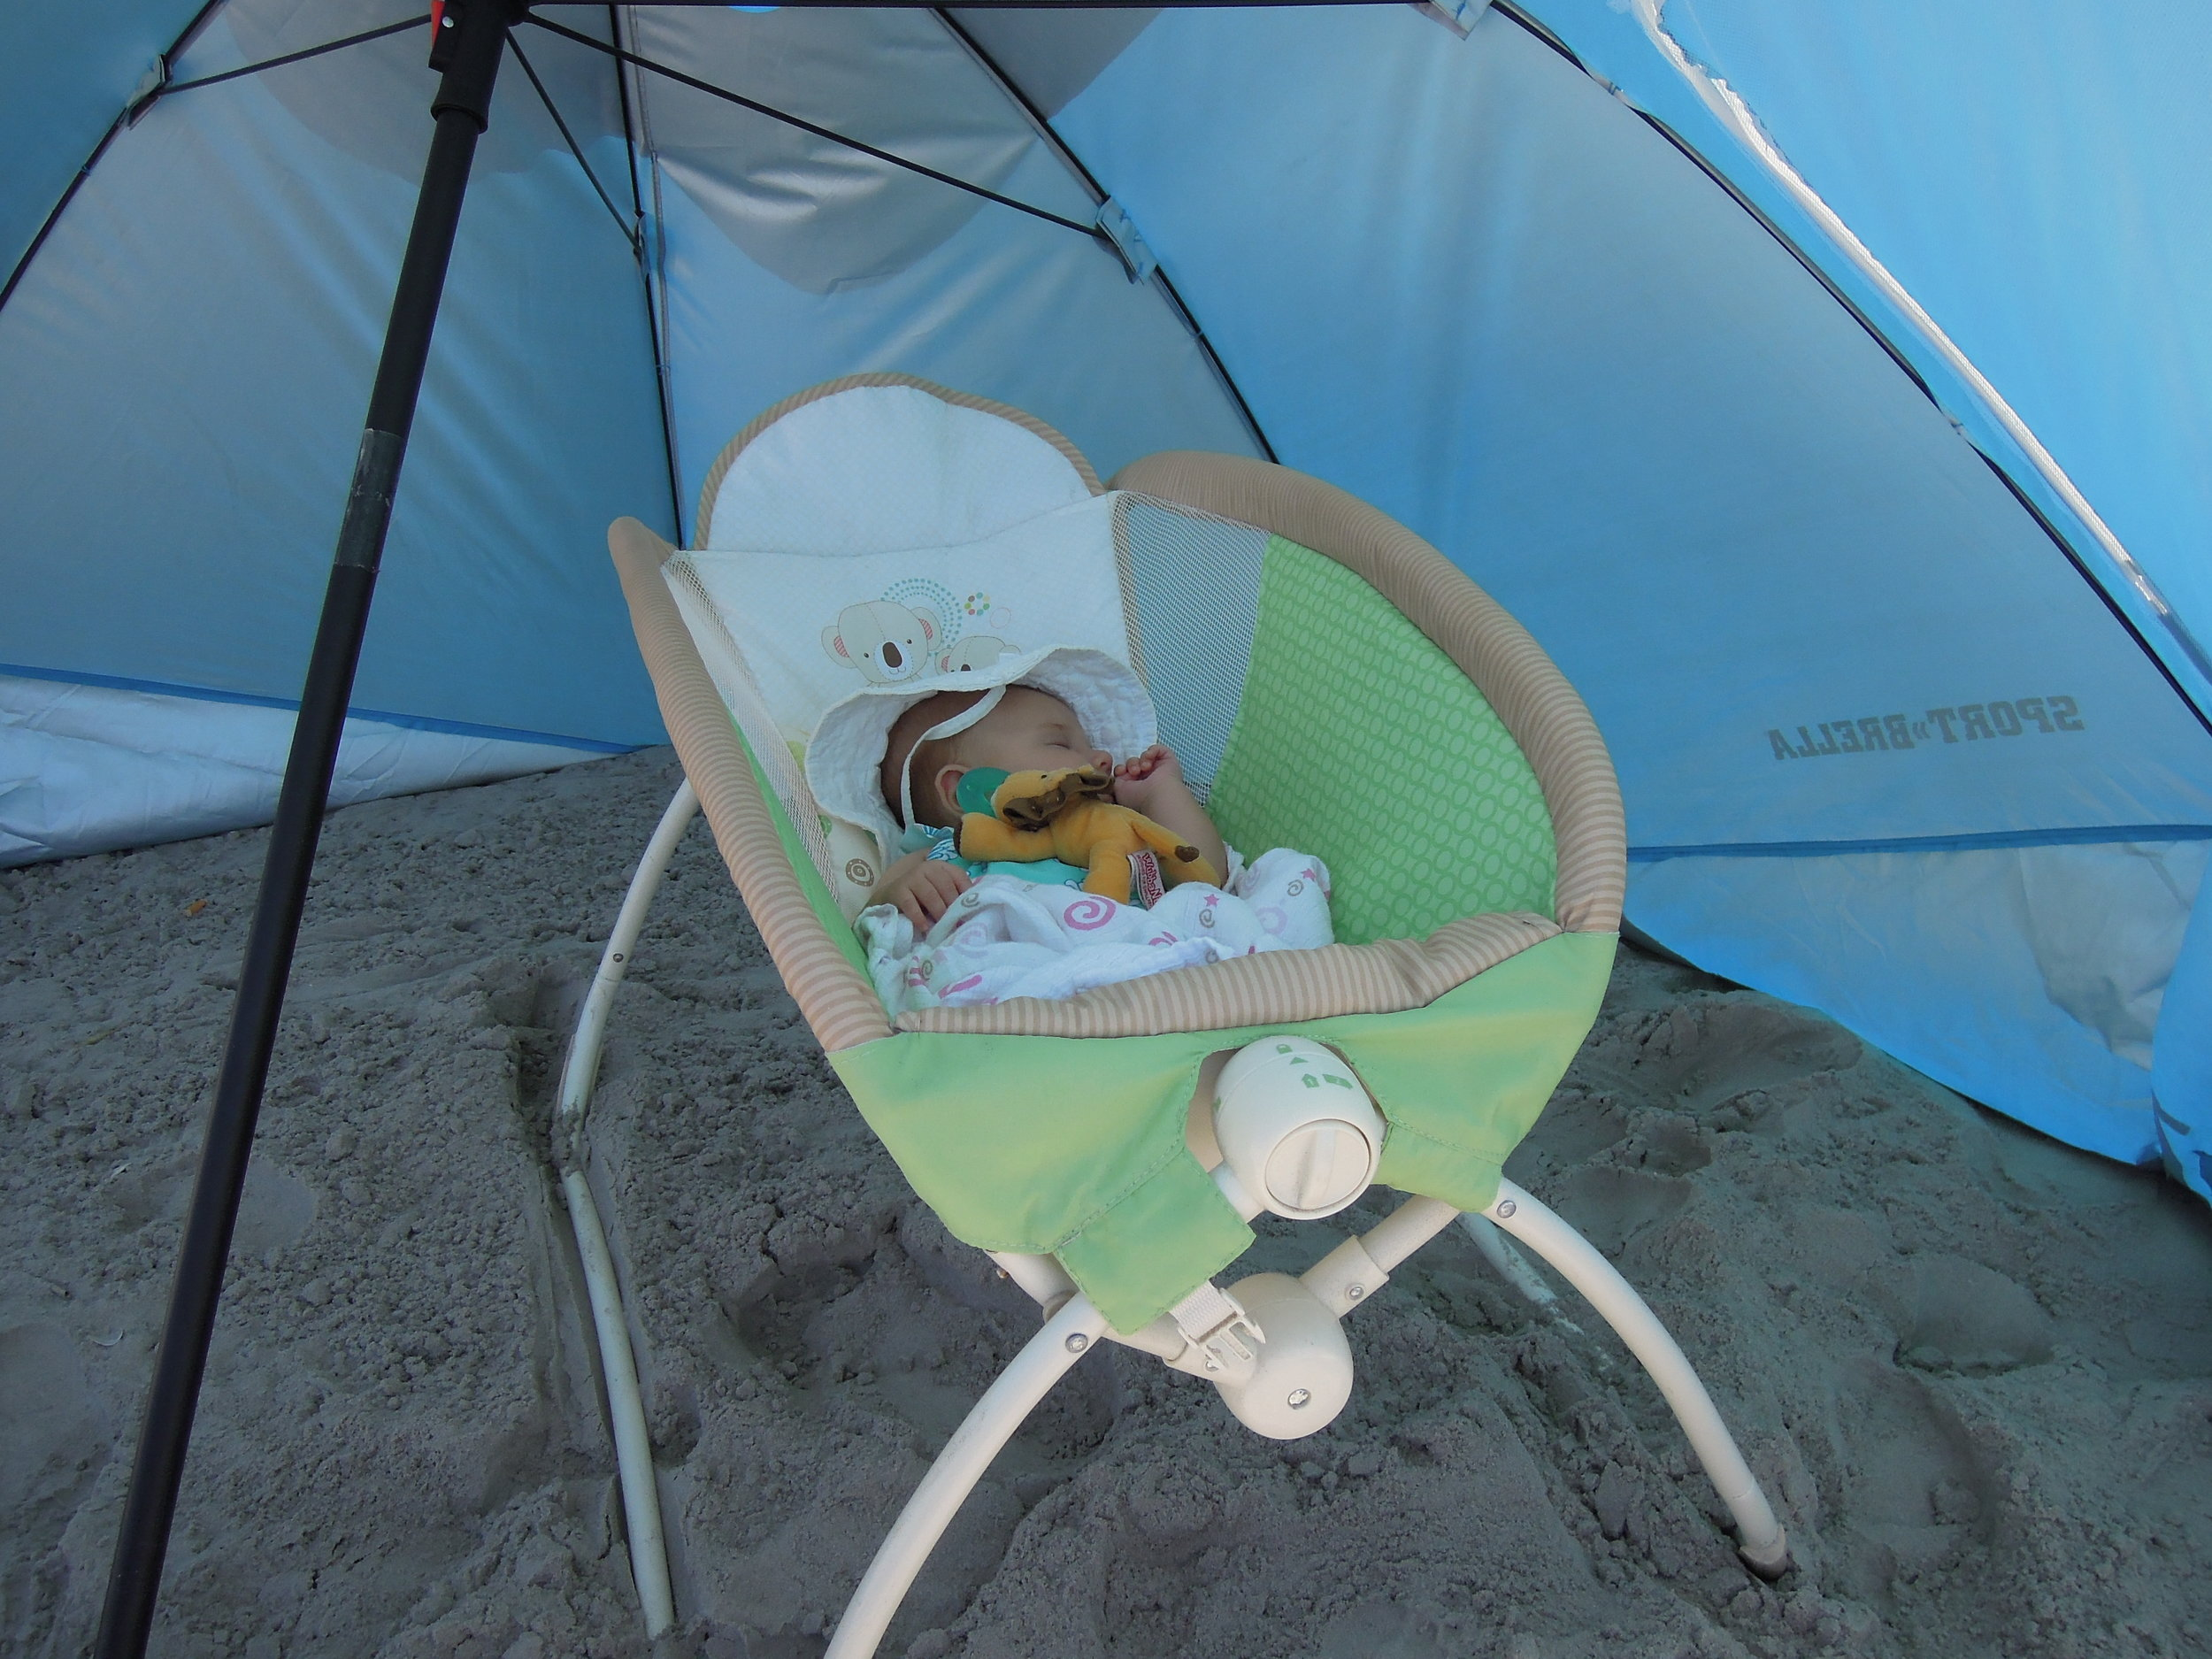 Baby Madeline sleeping blissfully under the Sport-brella